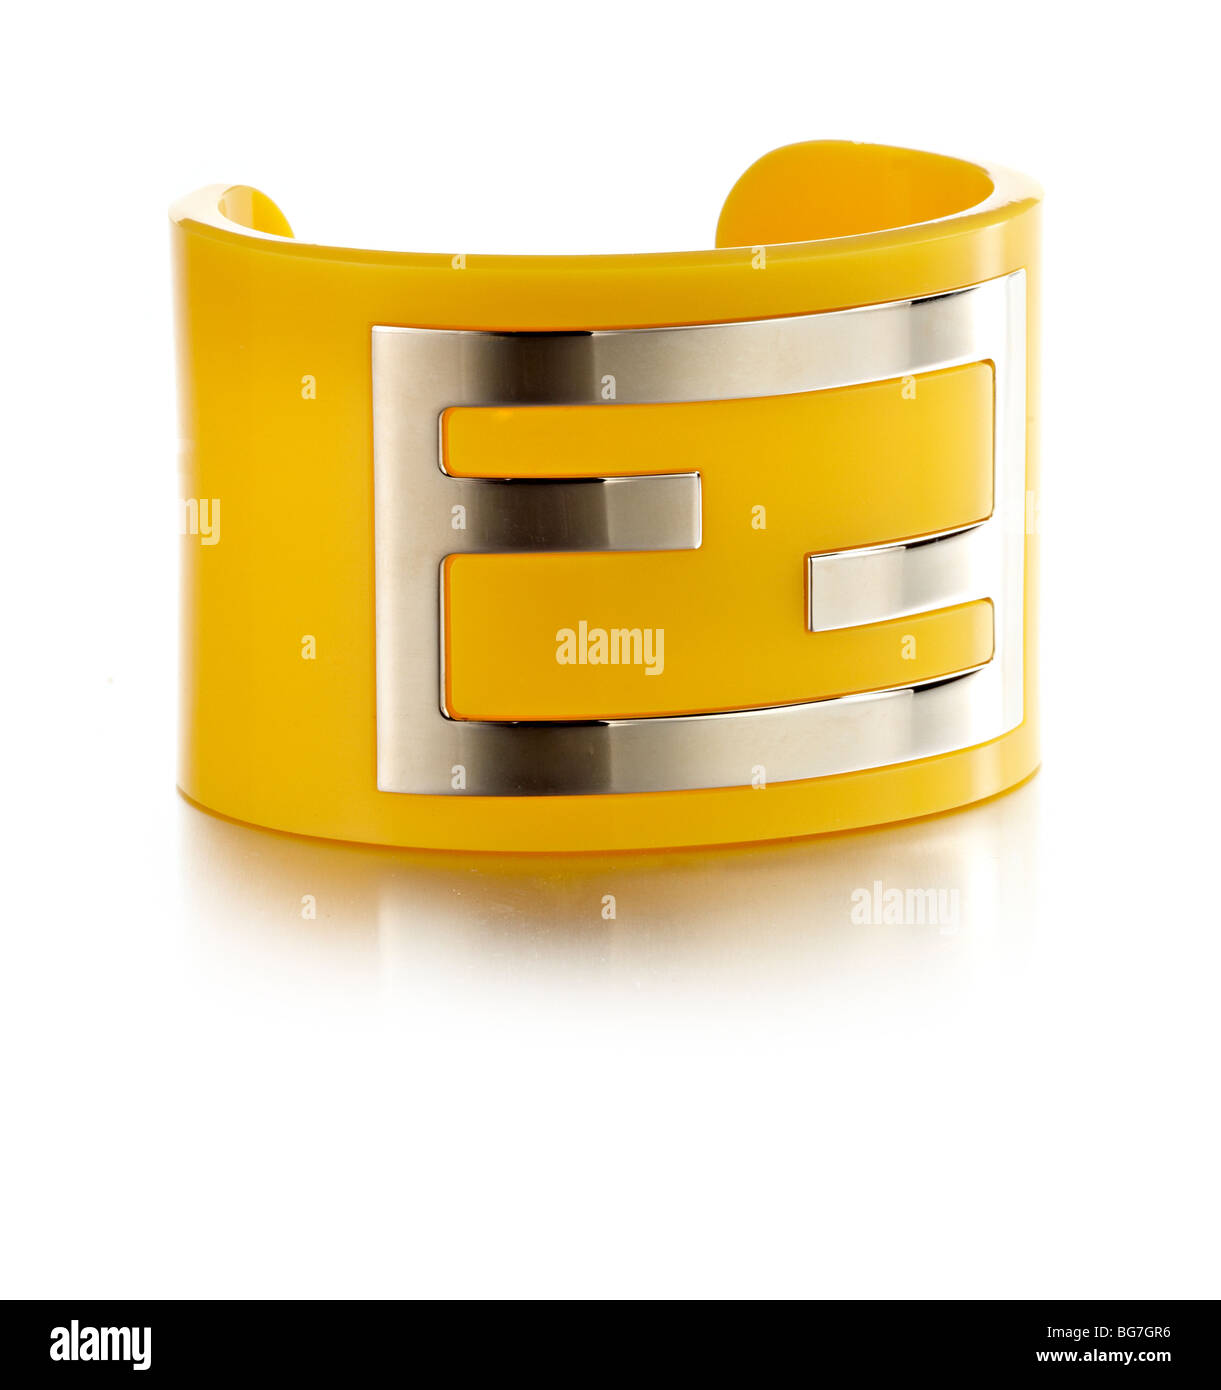 80's style orange plastic and metal bangle bracelet - Stock Image